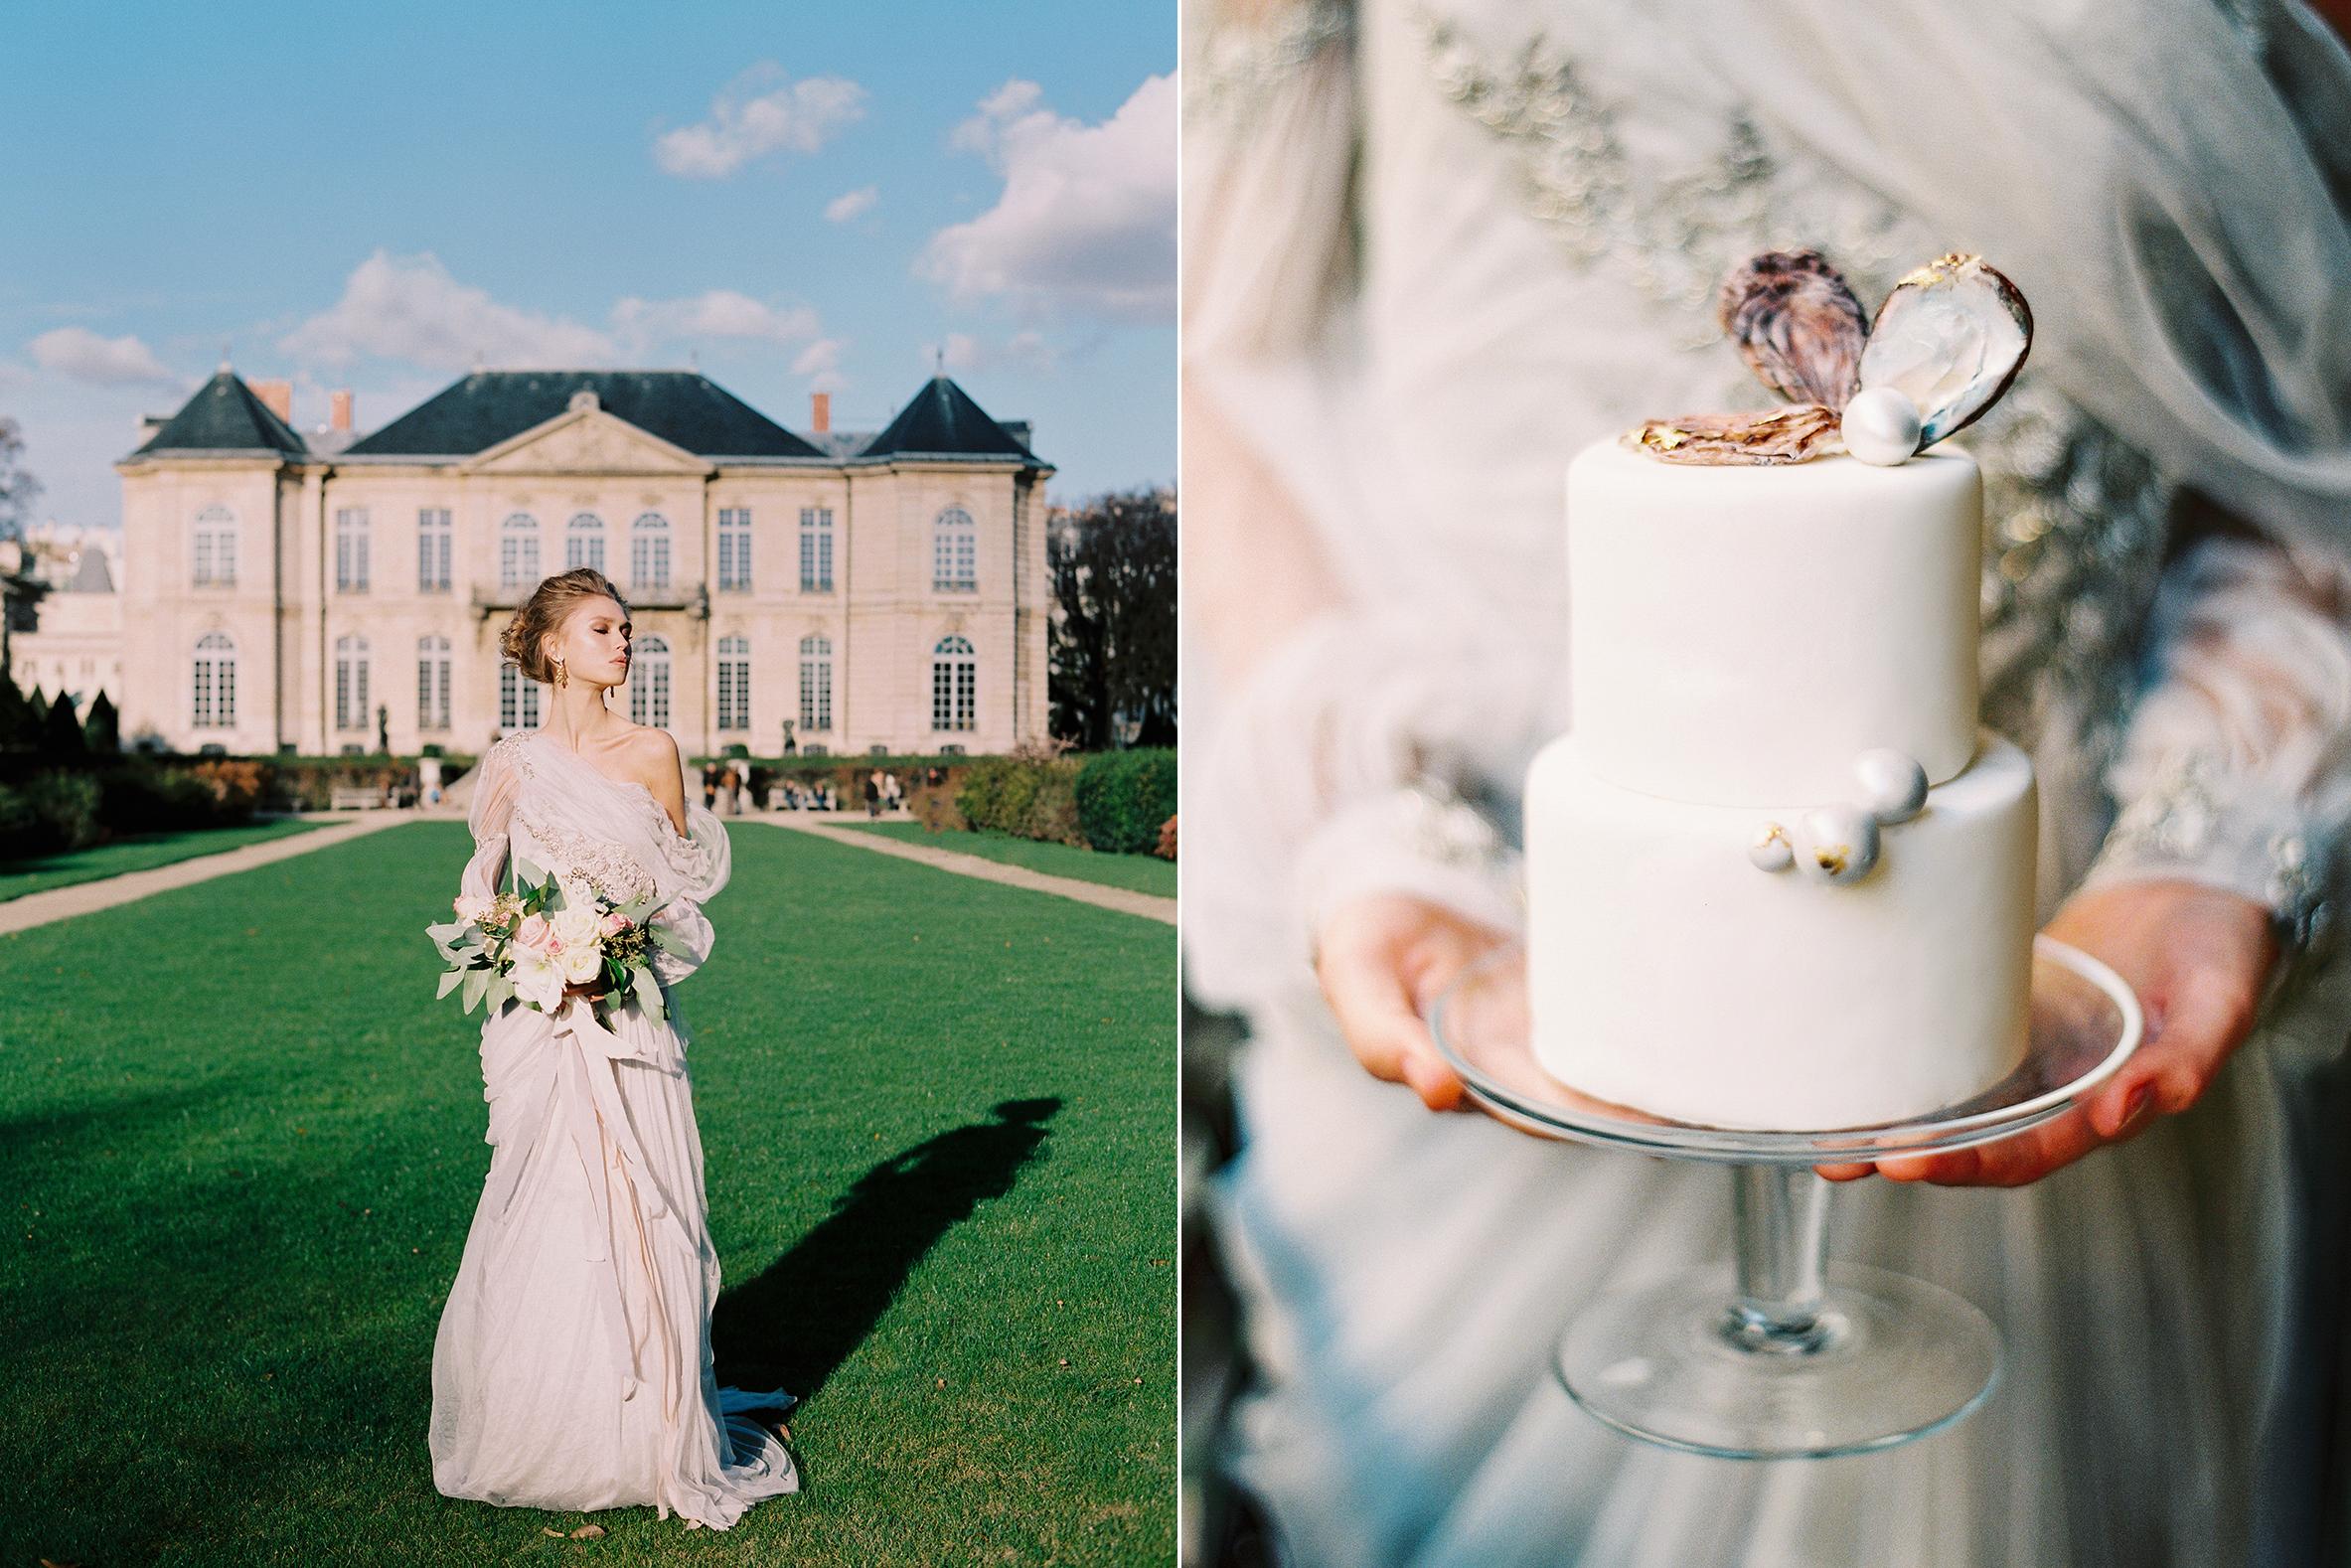 katie stoops photography-paris wedding-marchesa-cynthia martyn events20.jpg